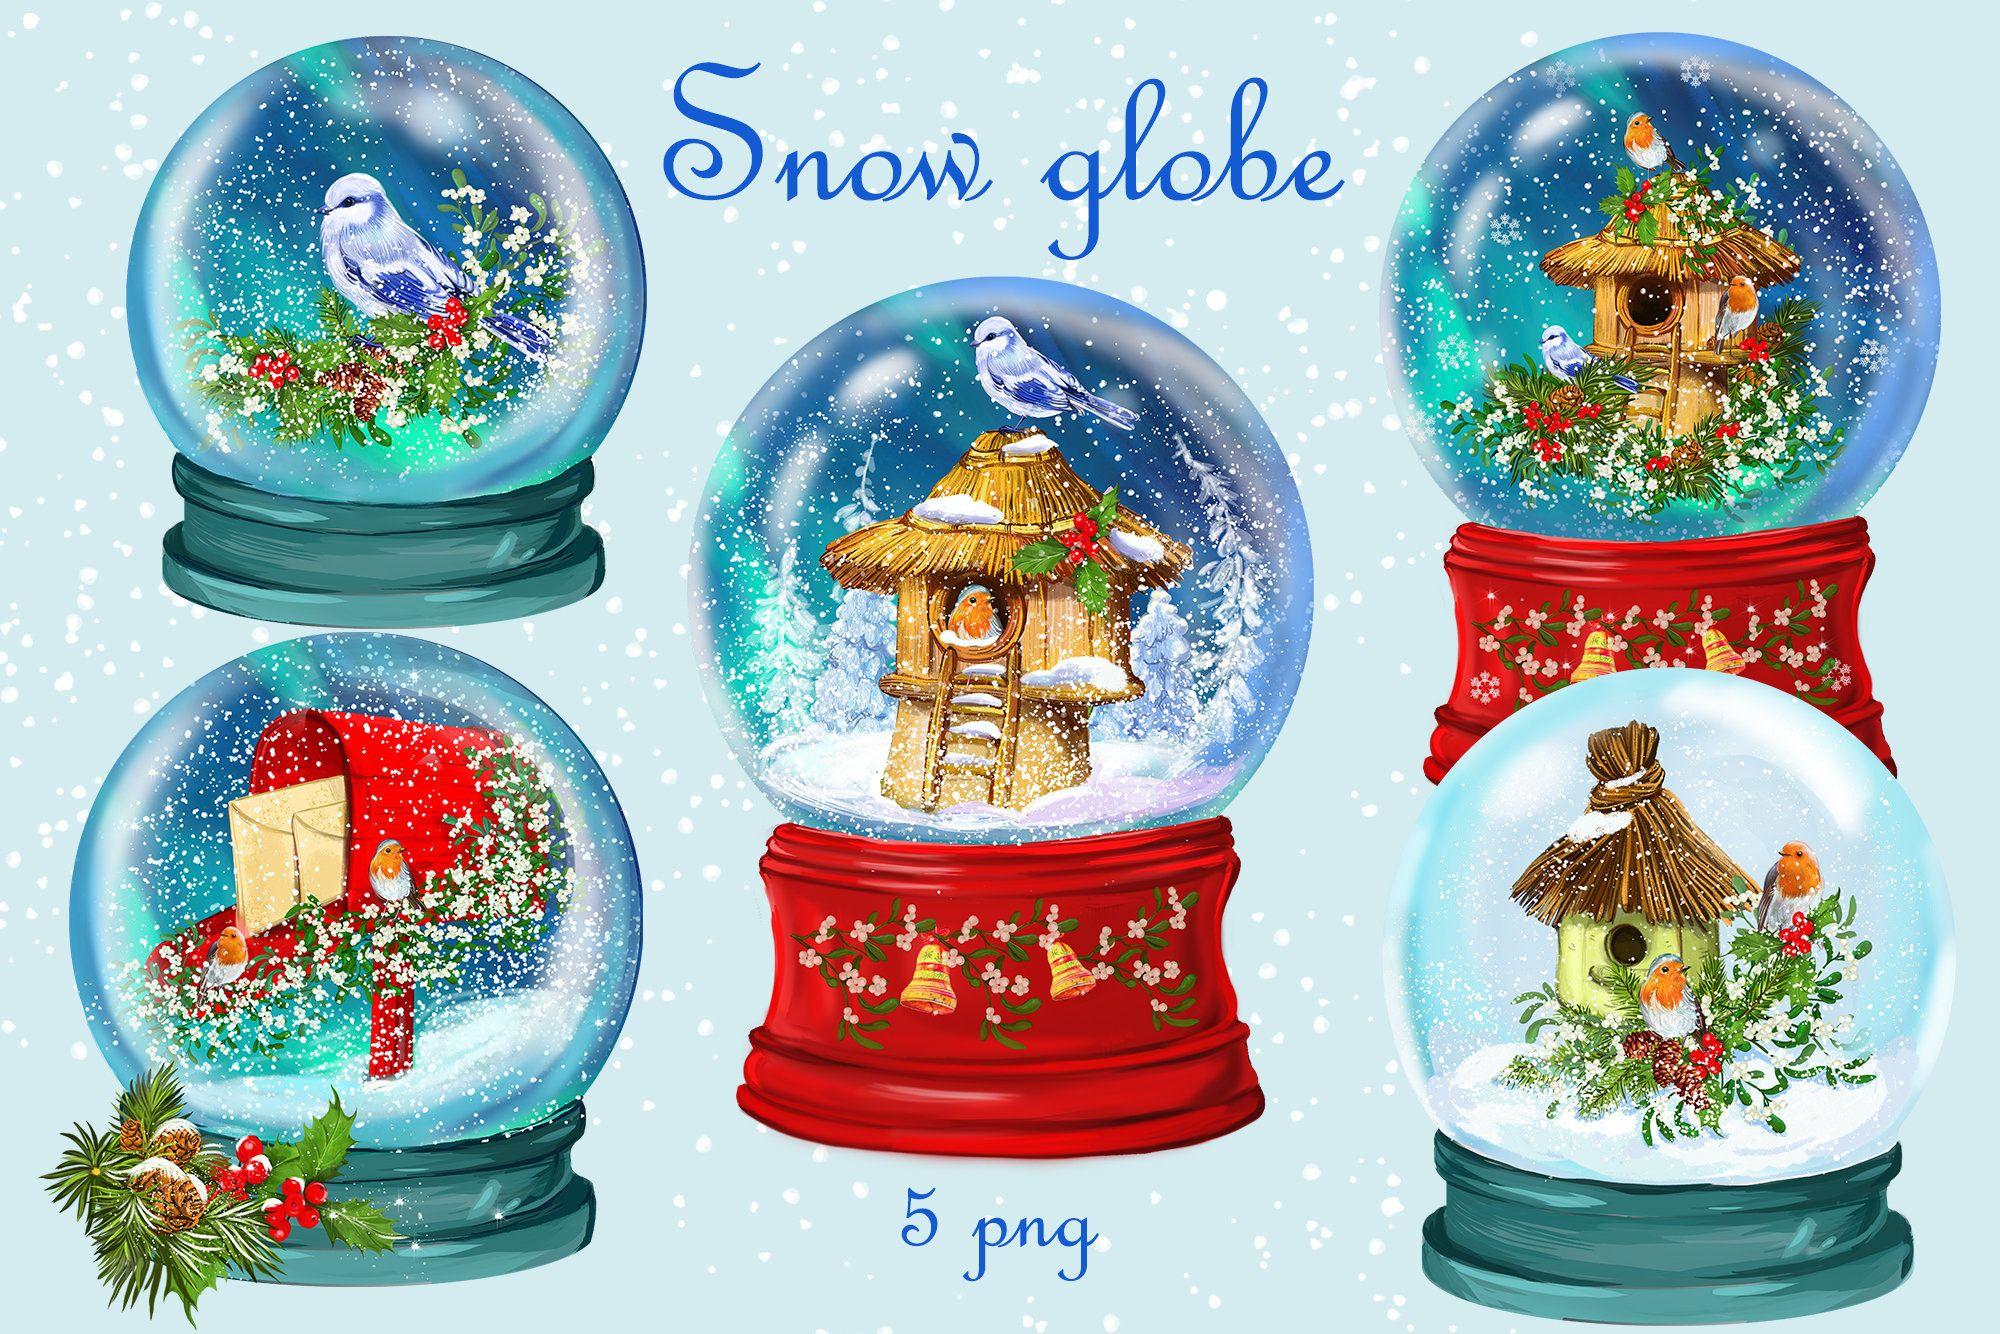 Christmas Globes Snow Globe Clipartbirdsbirdhouses Winter Etsy In 2021 Christmas Snow Globes Christmas Globes Globe Clipart